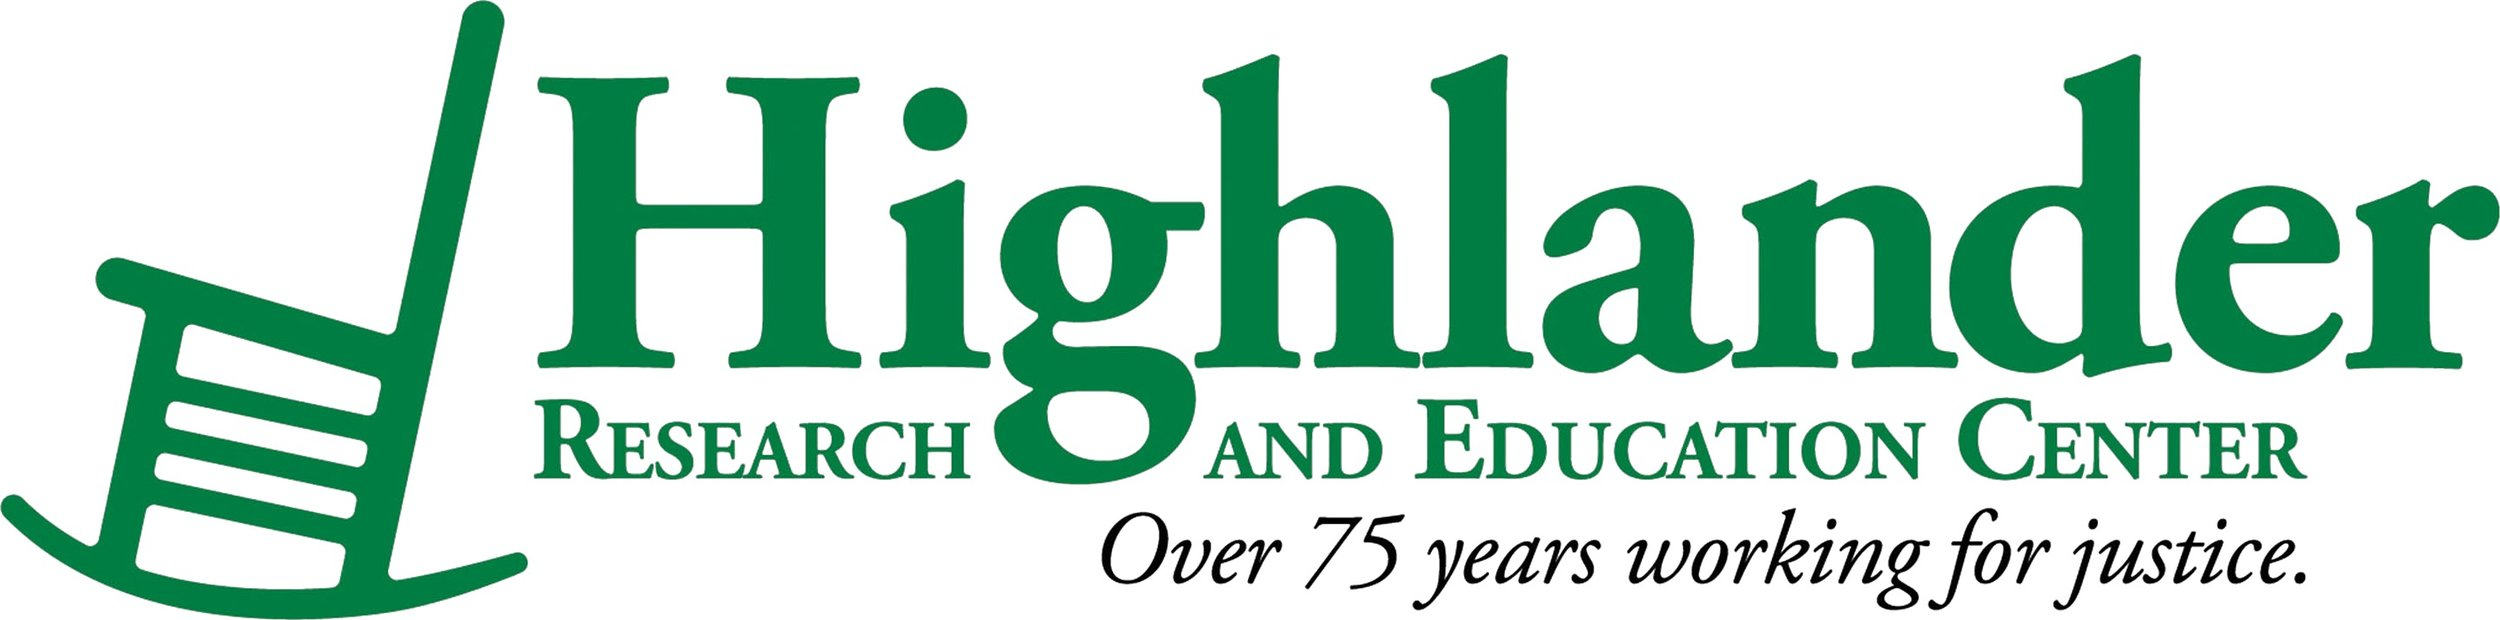 new-logo-green.75 yrs.jpg